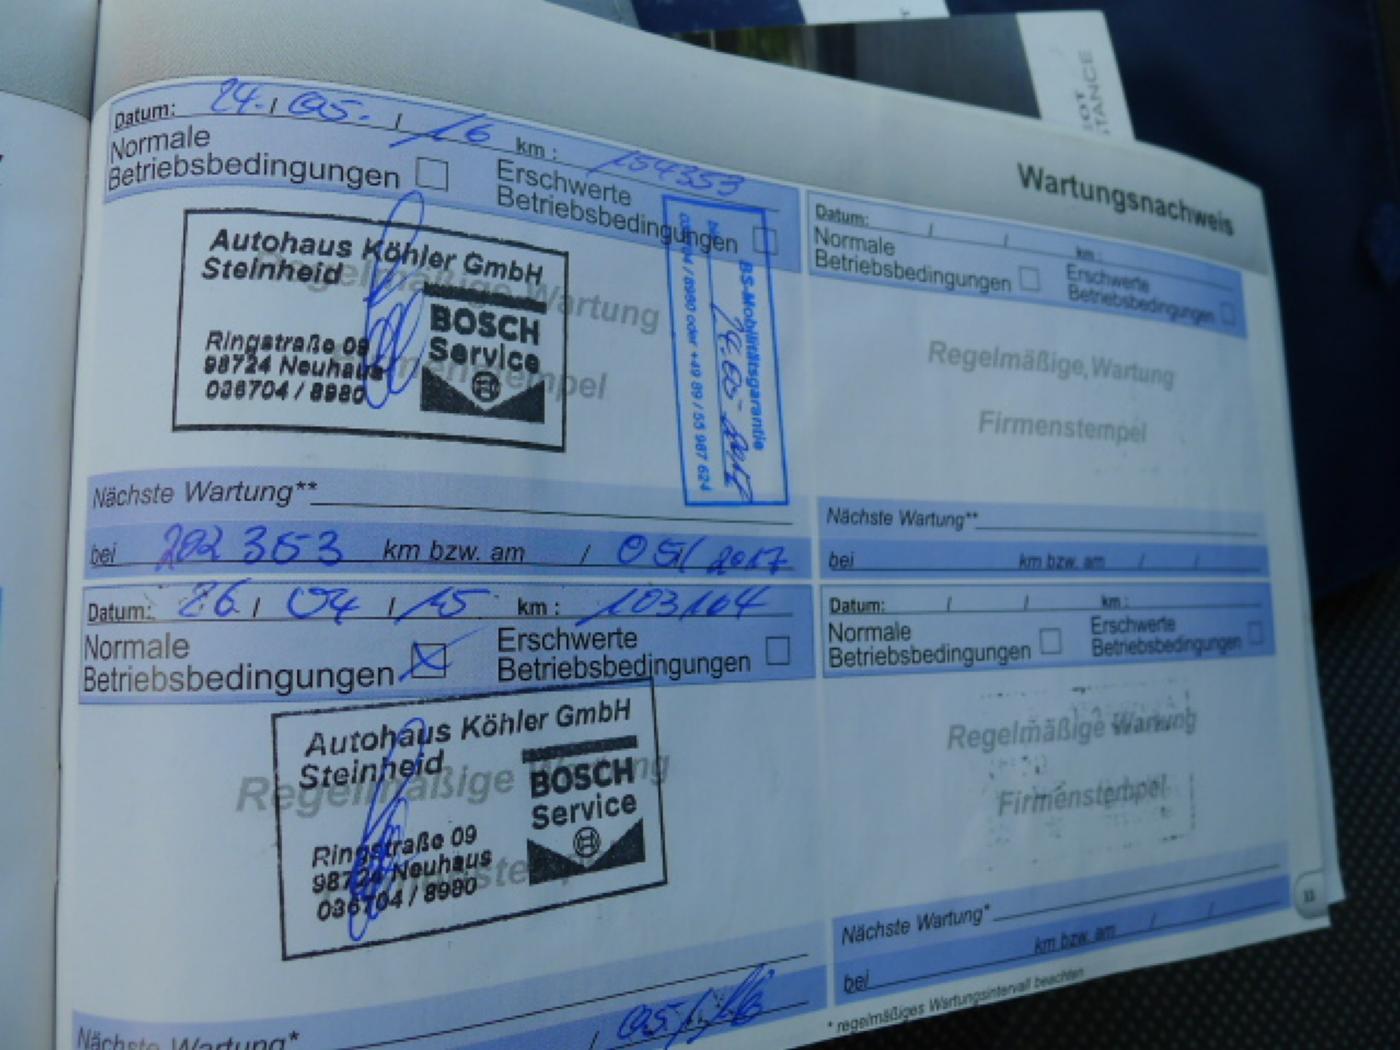 Peugeot Boxer 2.2 HDI L1H1 Klima Akce!!! Novinka - 15